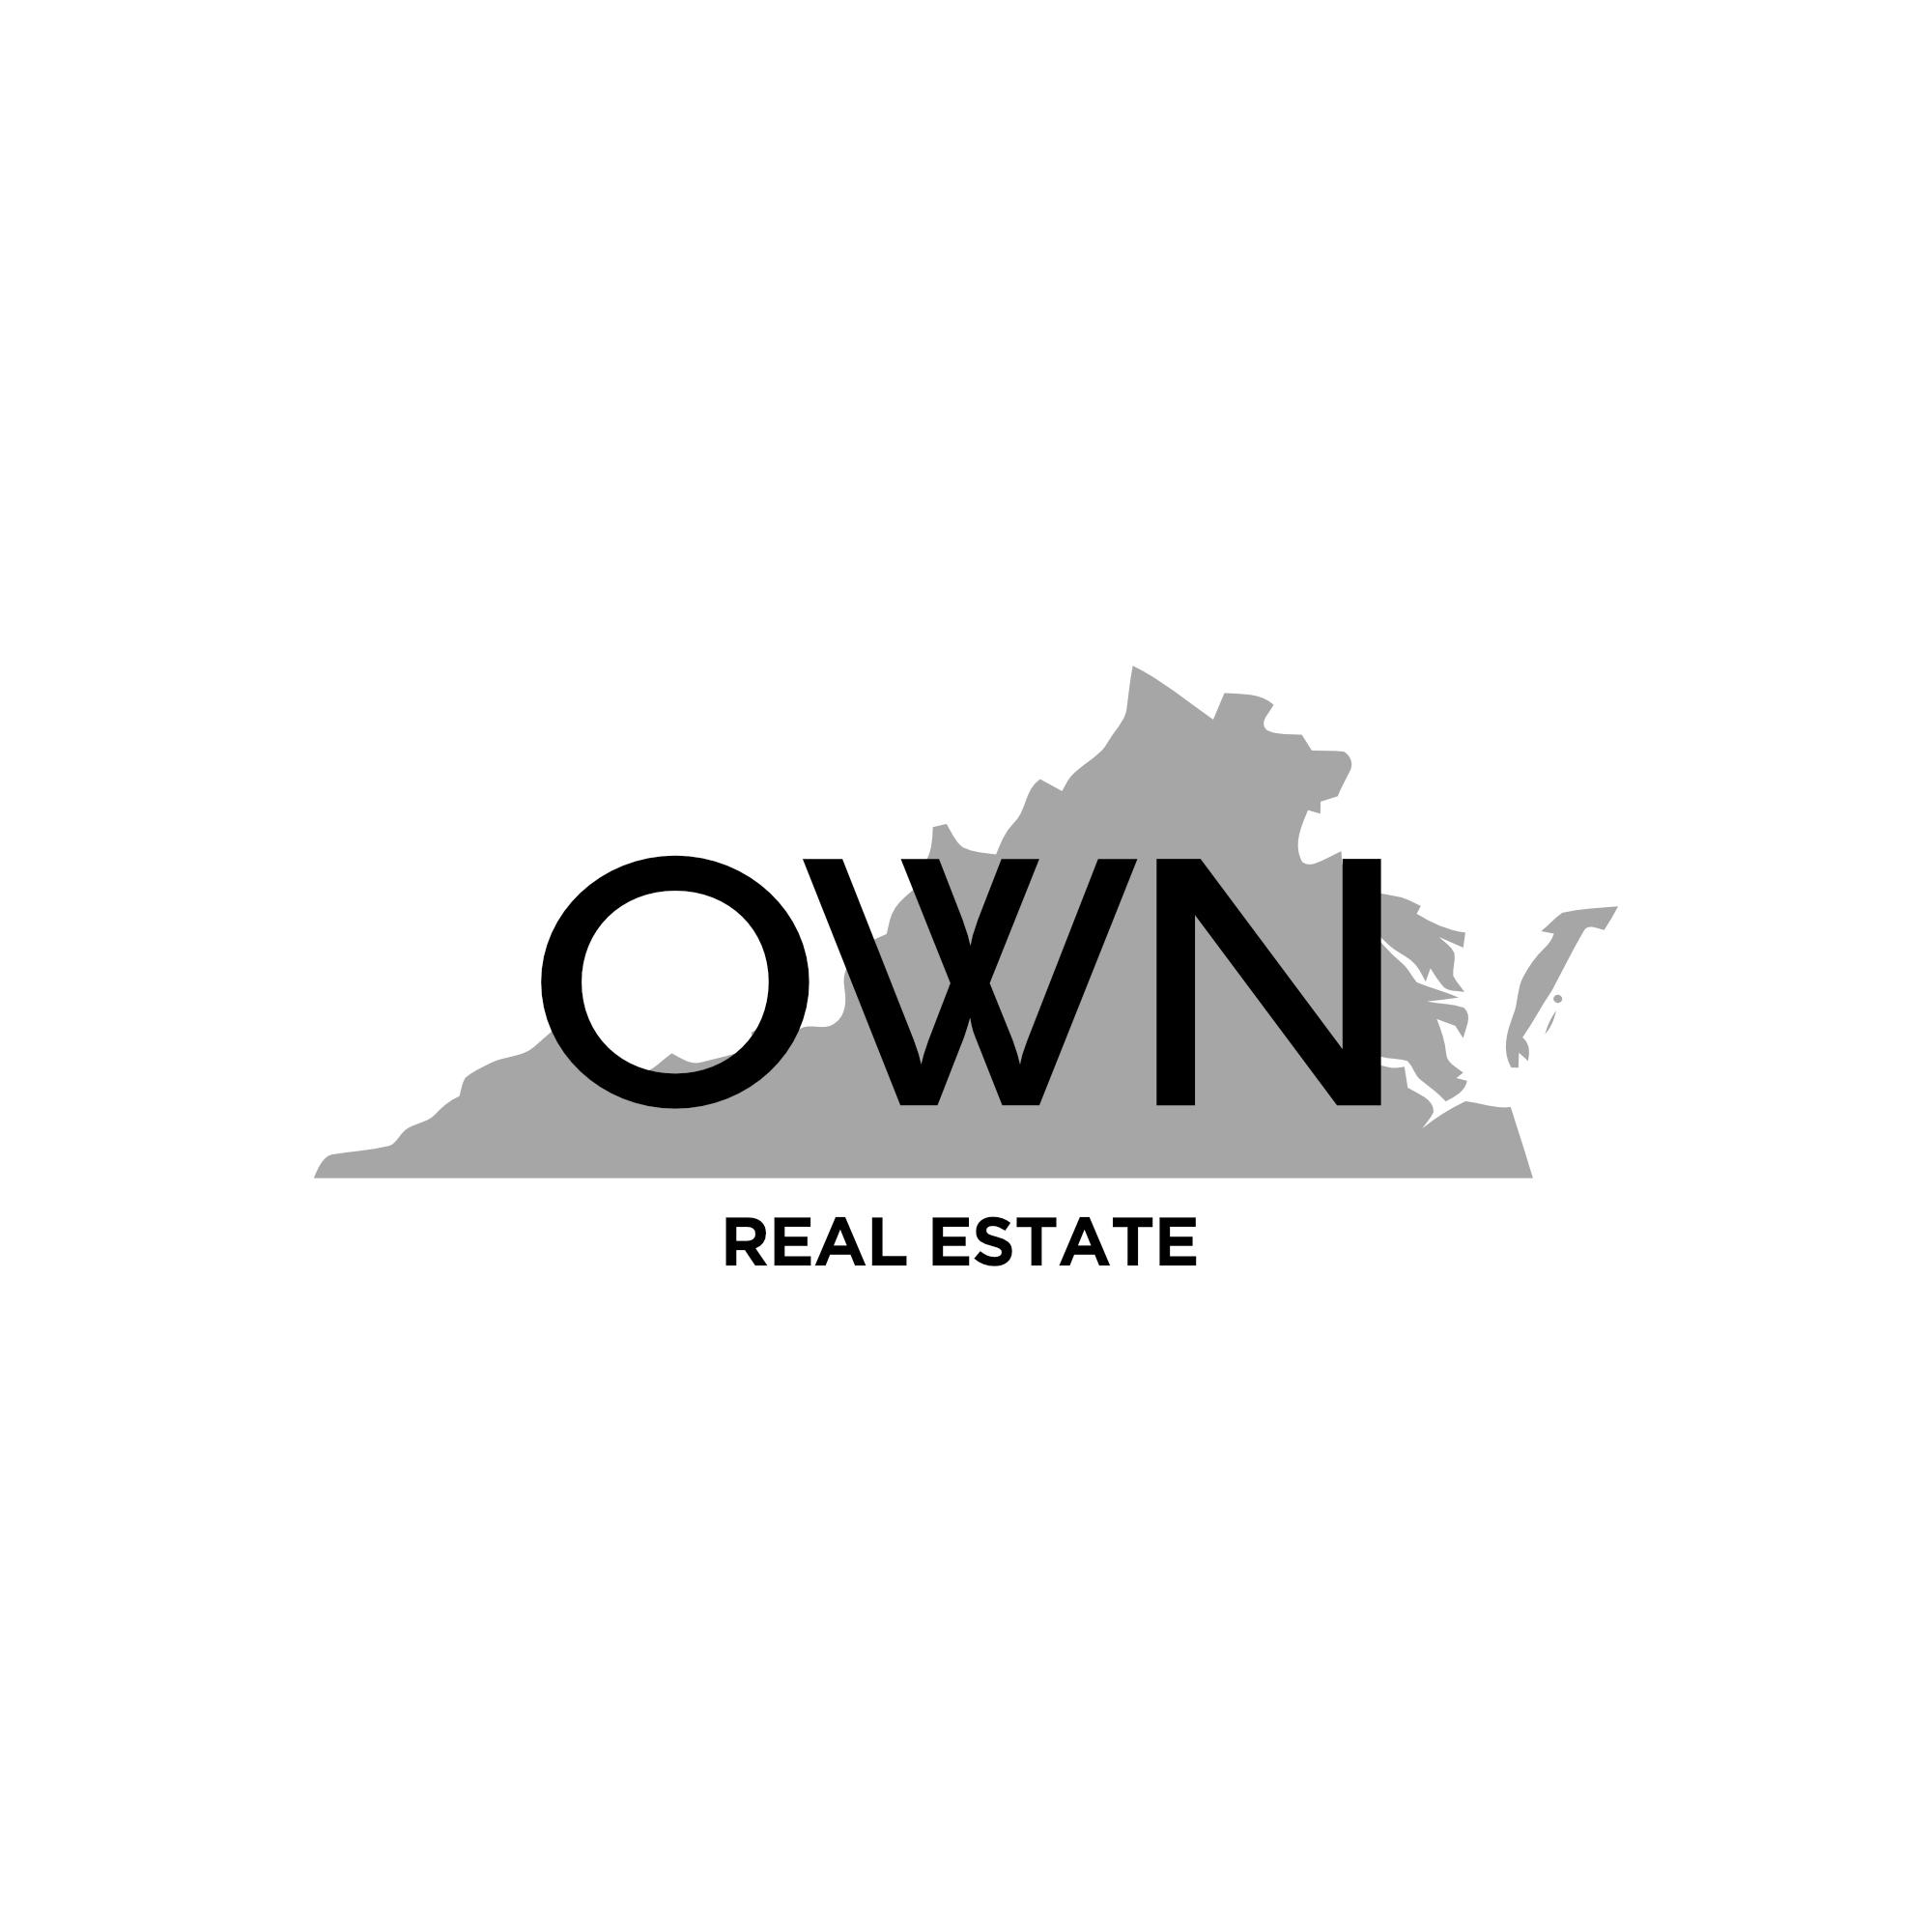 Your Realtor/Firm Logo